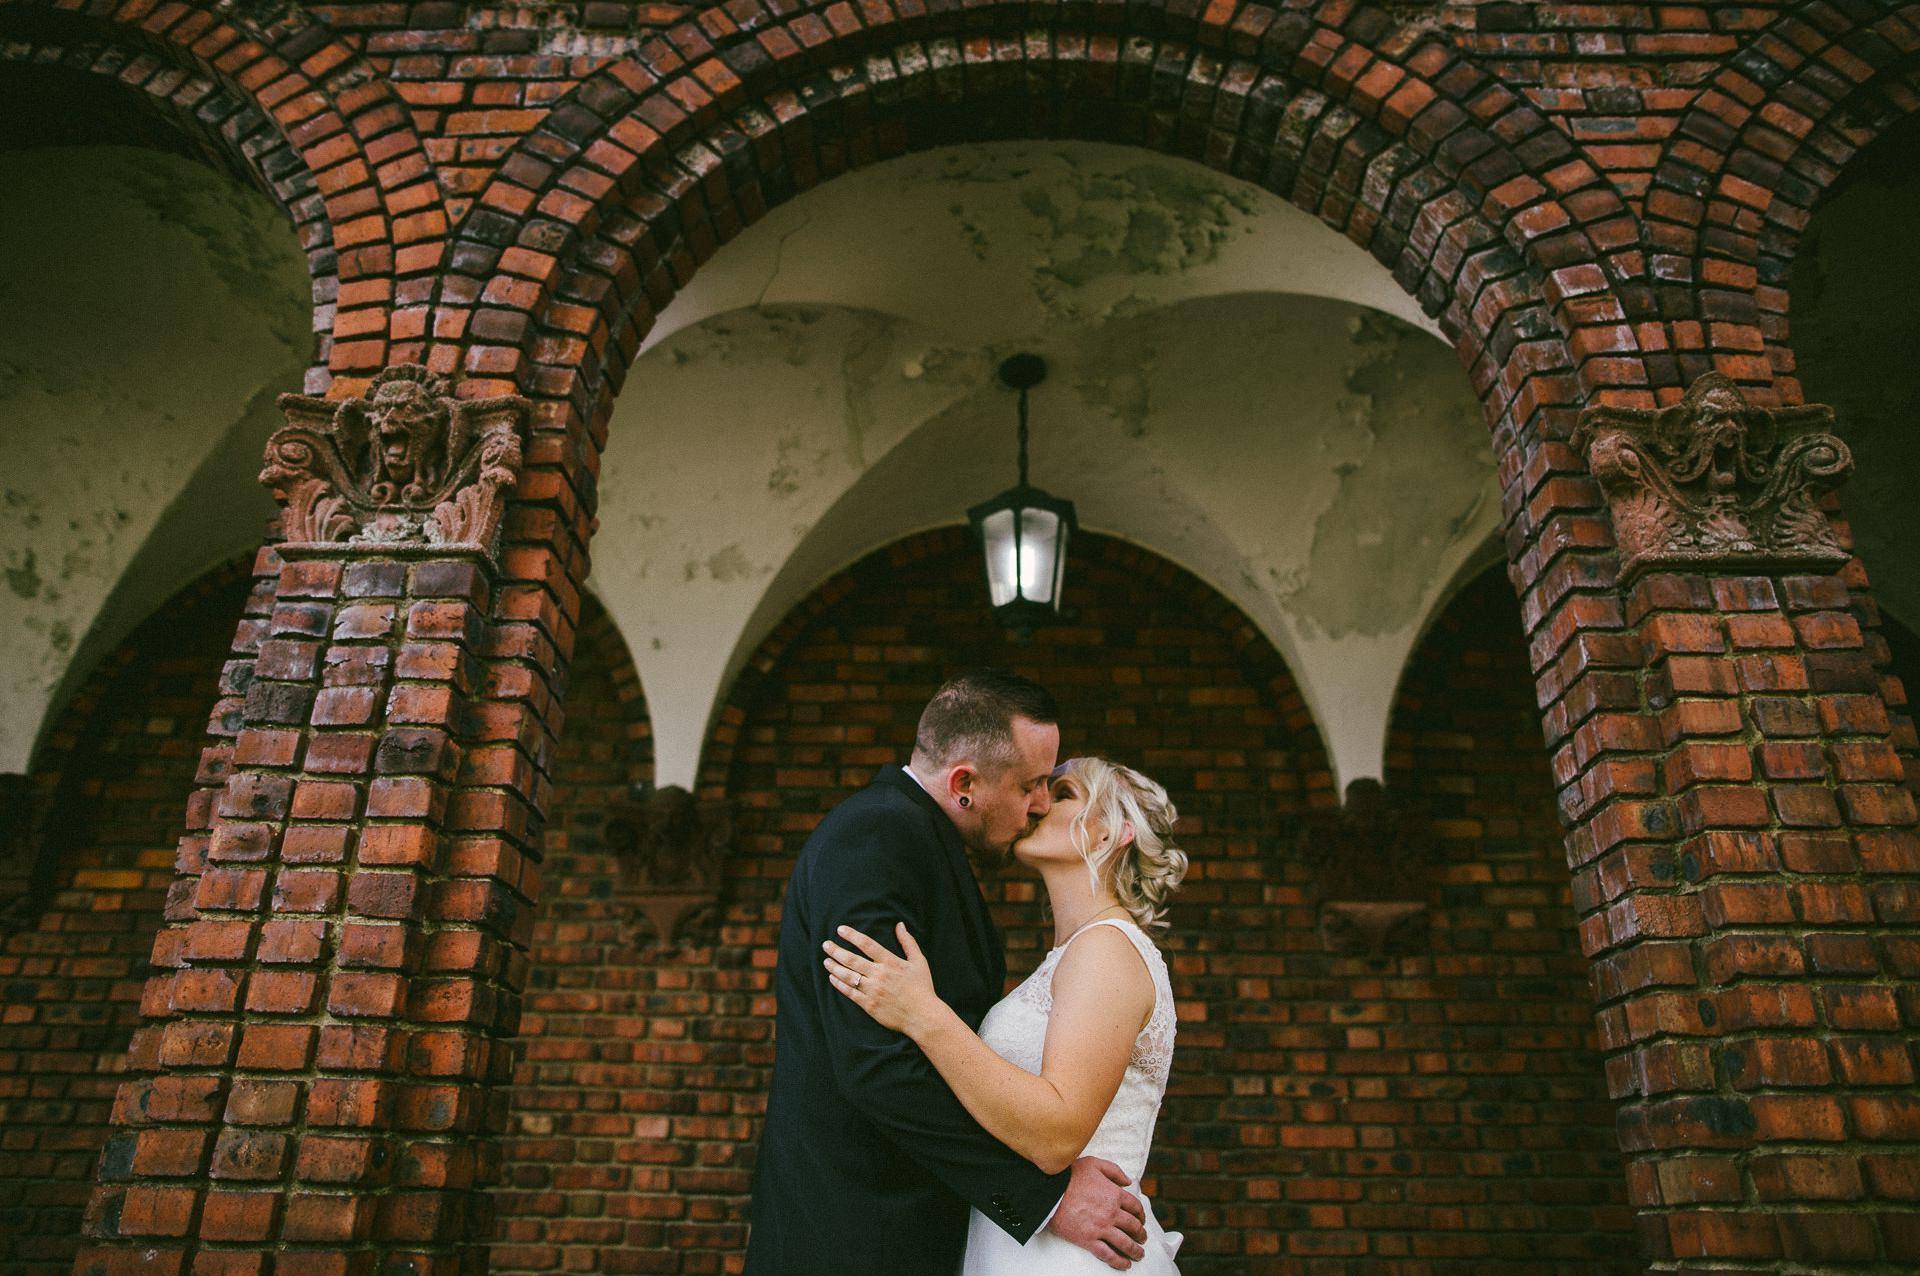 Goldhorn Brewery Wedding Photos in Cleveland 1 35.jpg